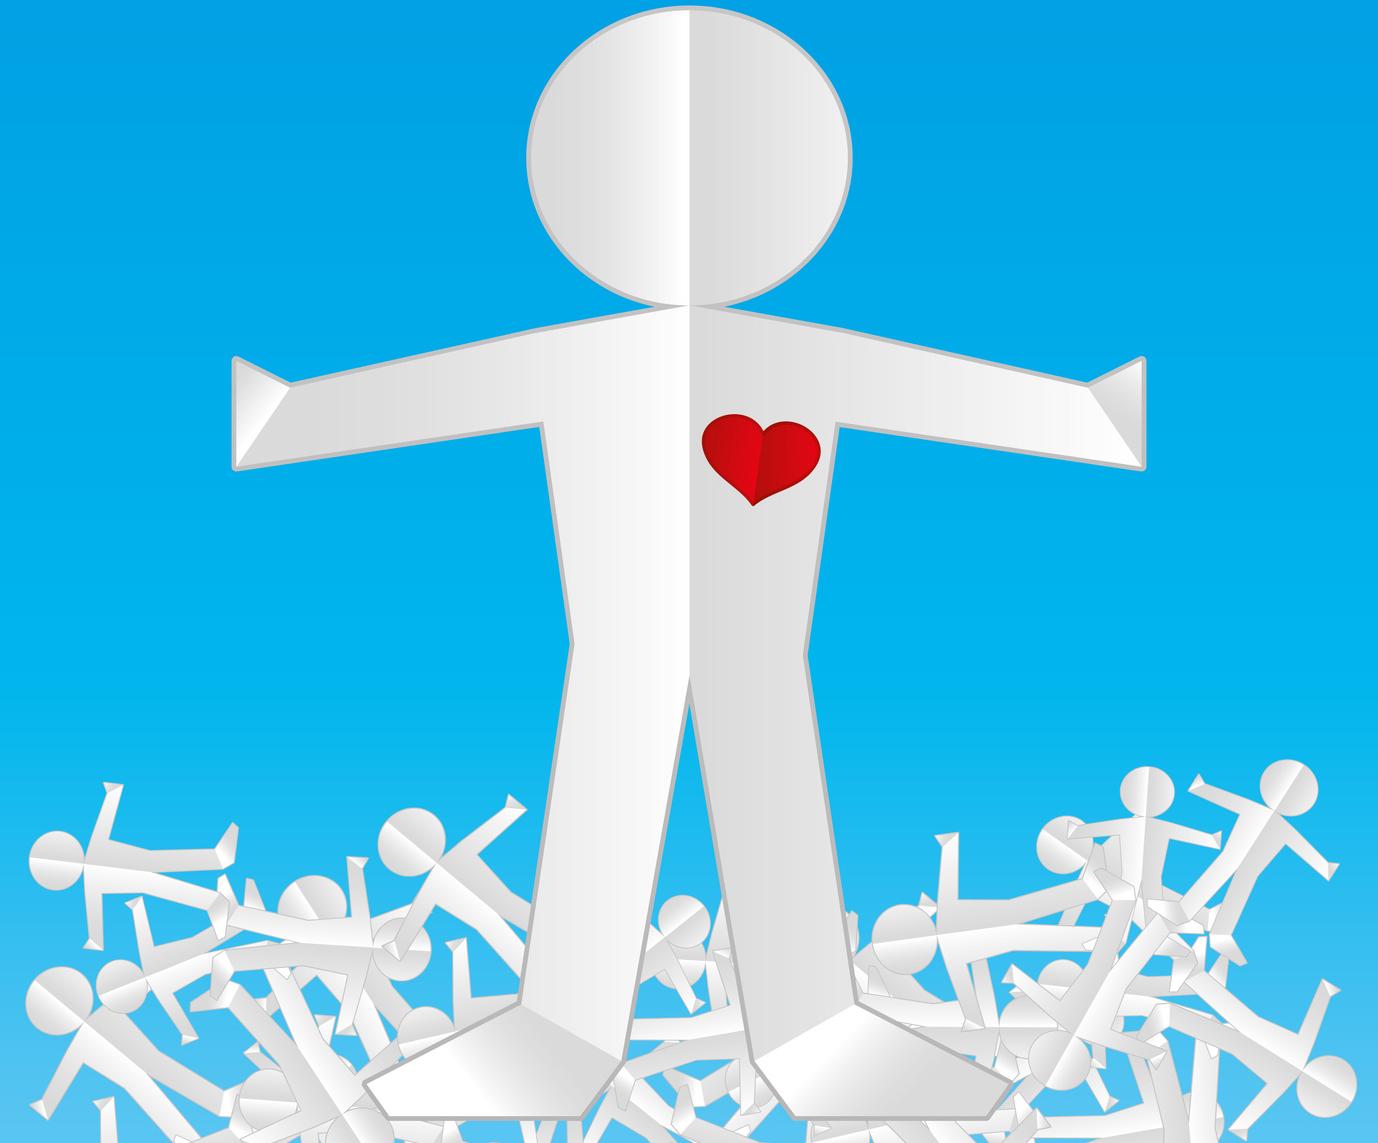 Caring Leadership – True Story of Leader